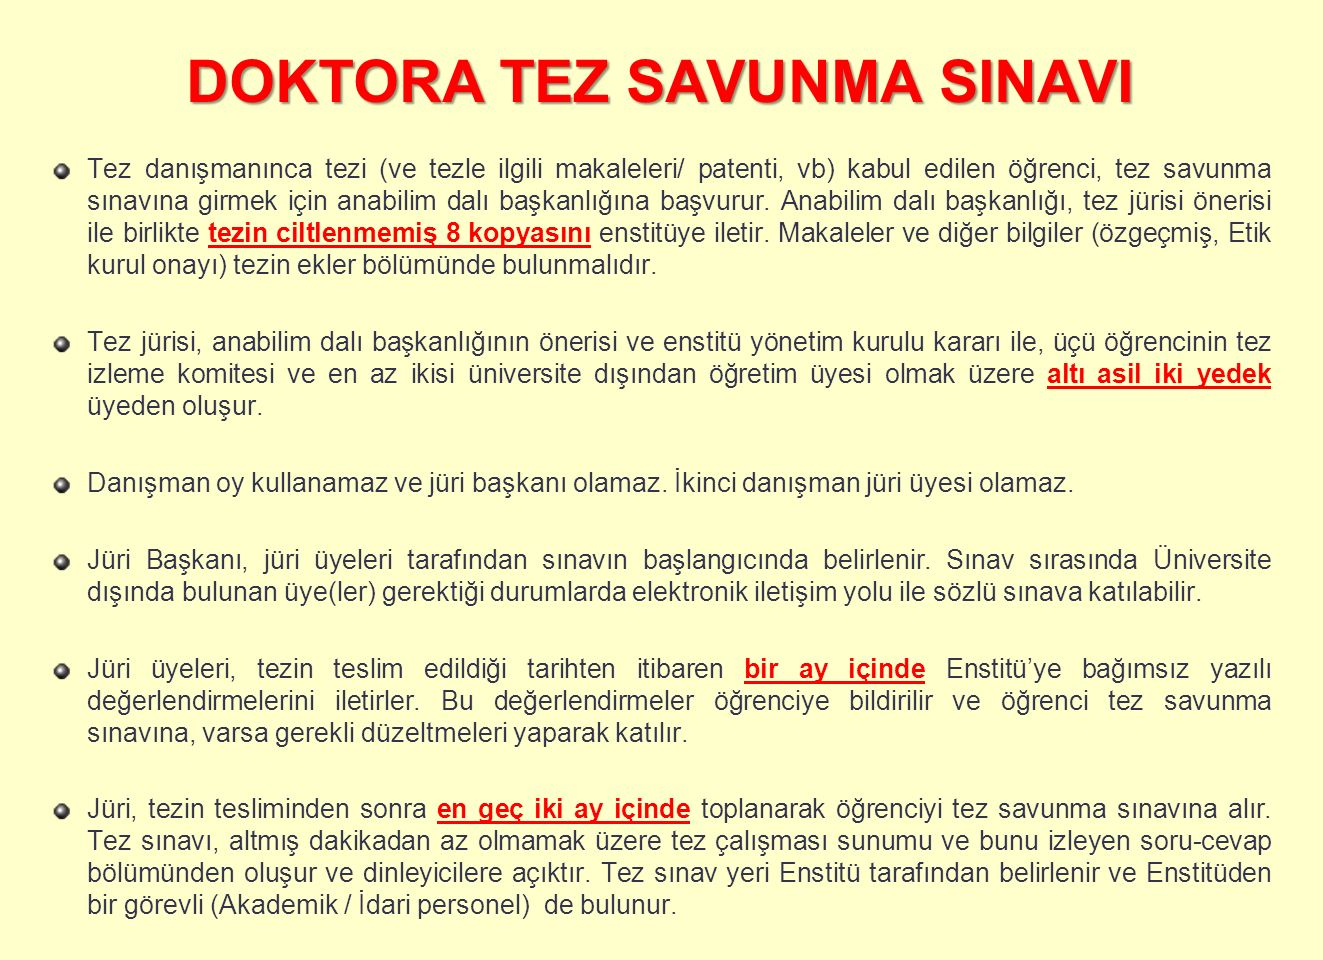 DOKTORA TEZ SAVUNMA SINAVI